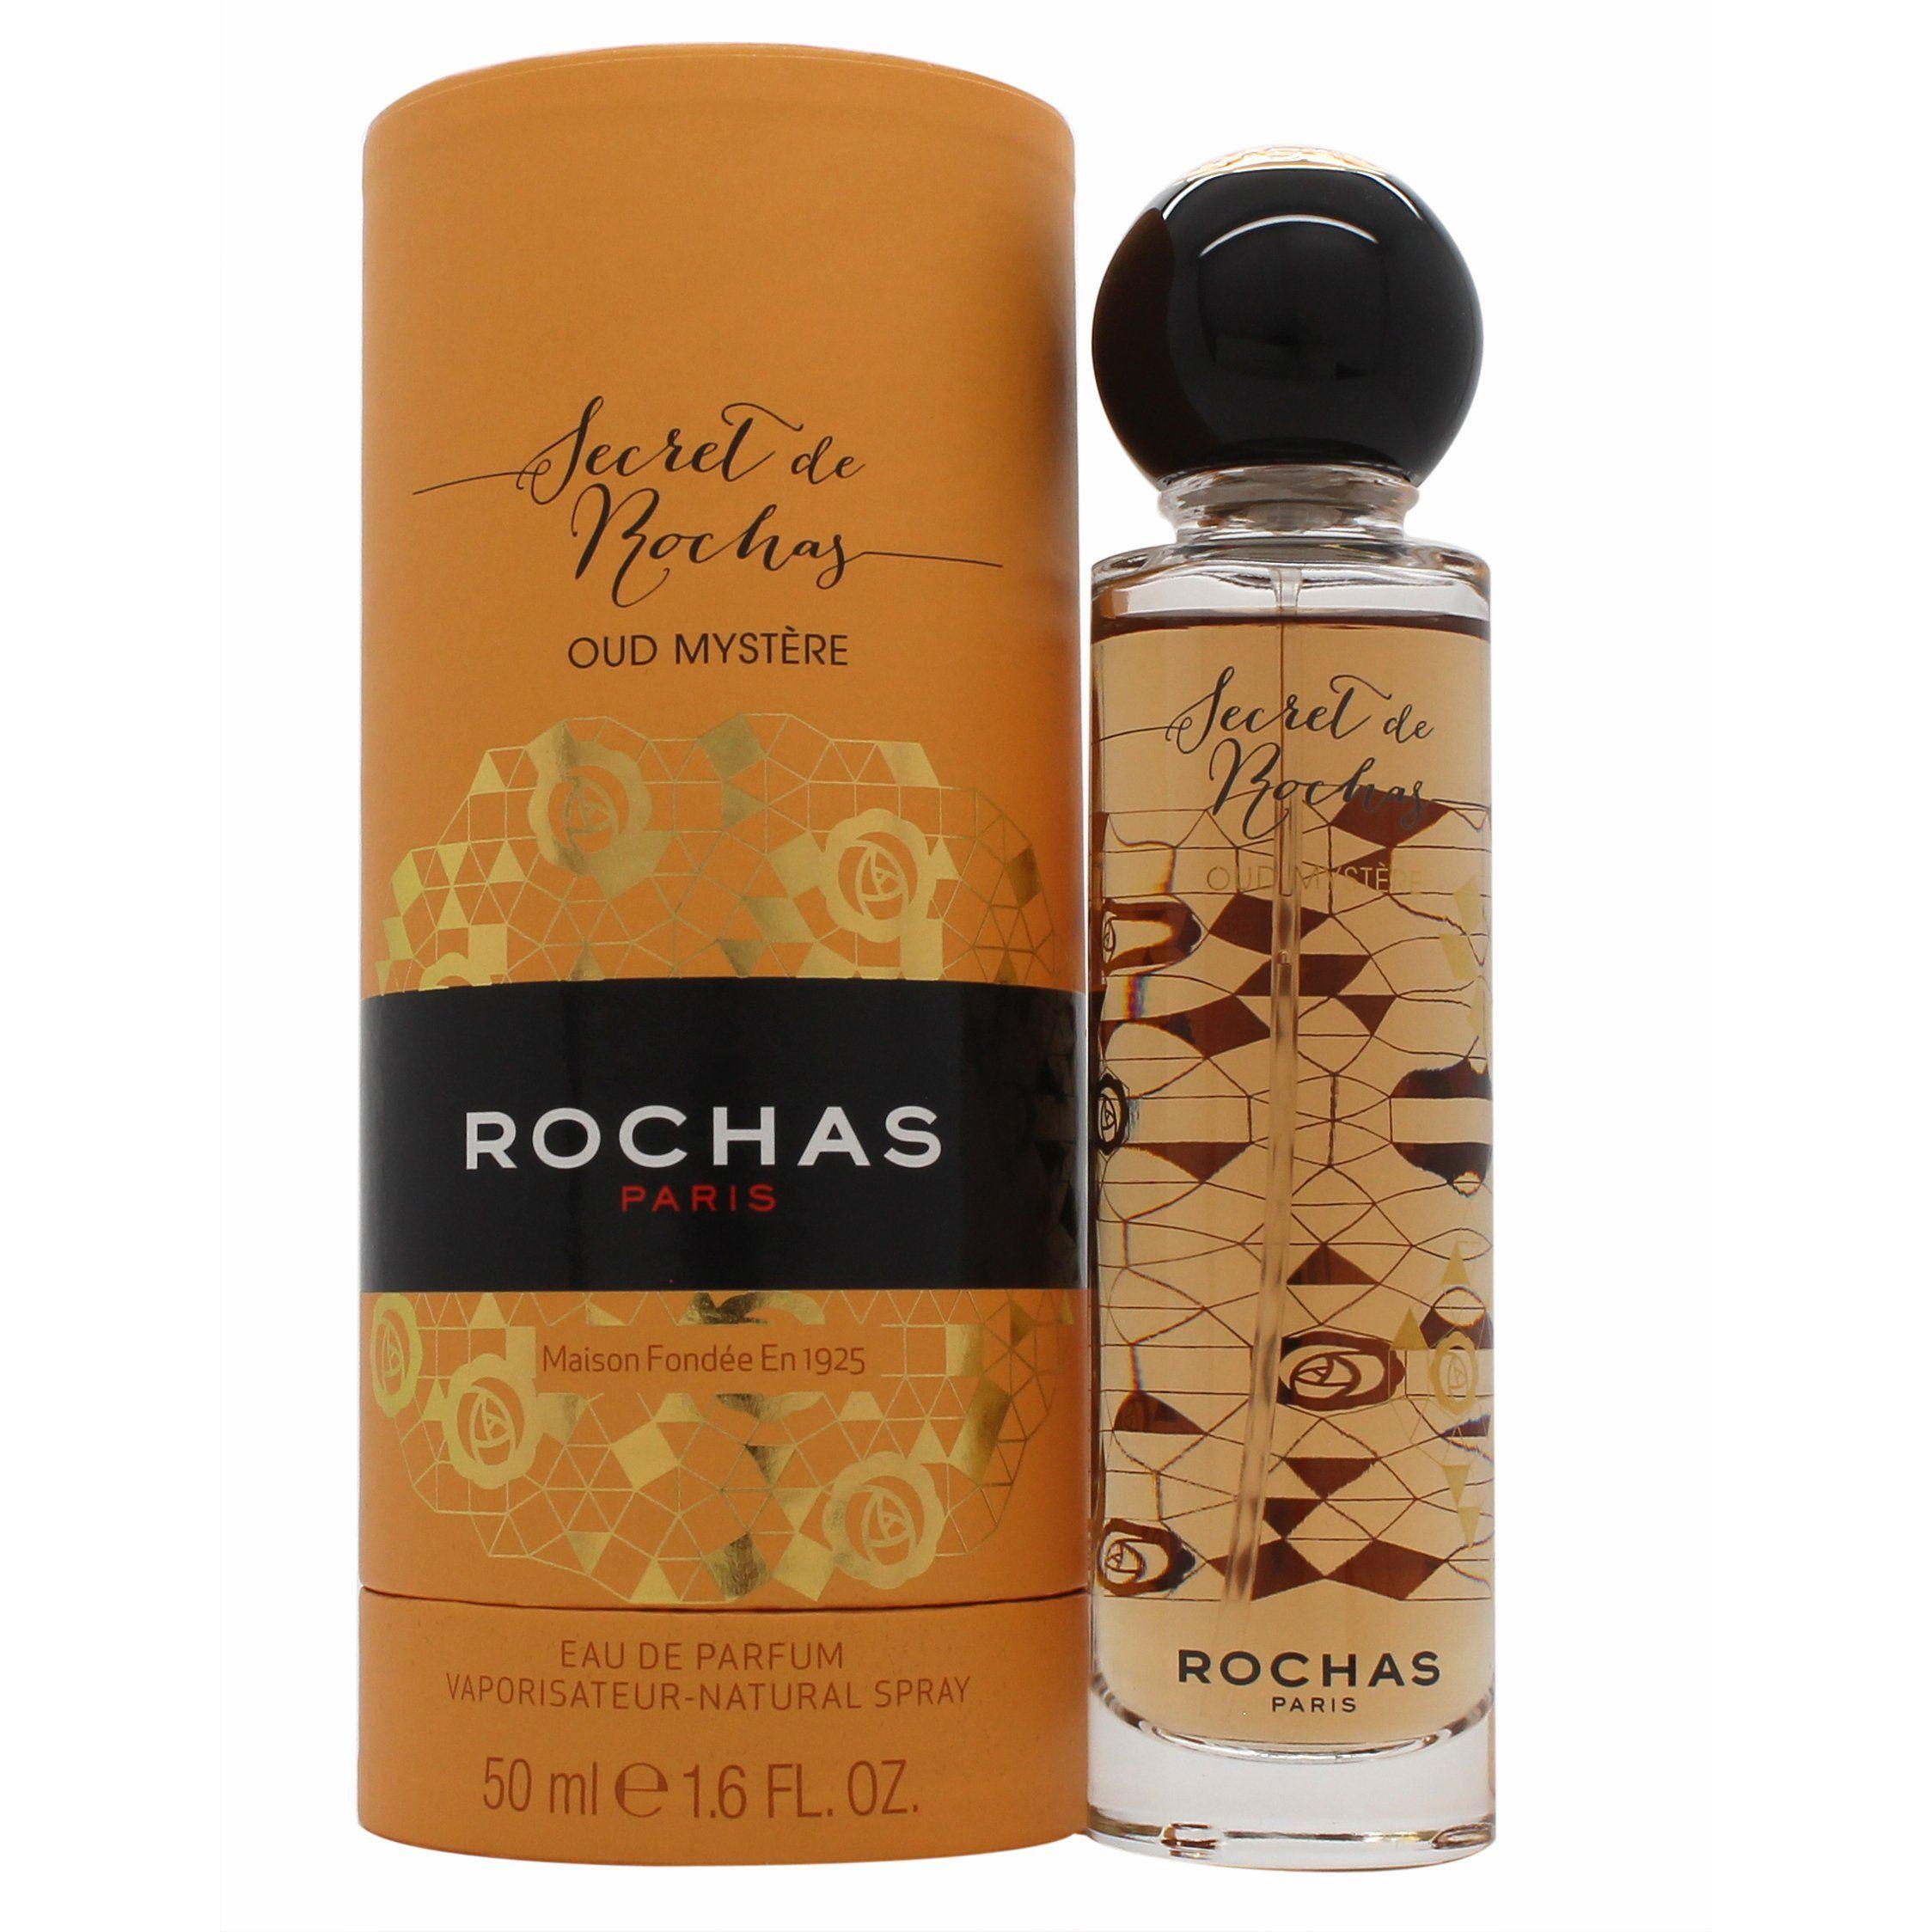 Rochas Secret de Rochas Oud Mystere Eau de Parfum 50ml Spray